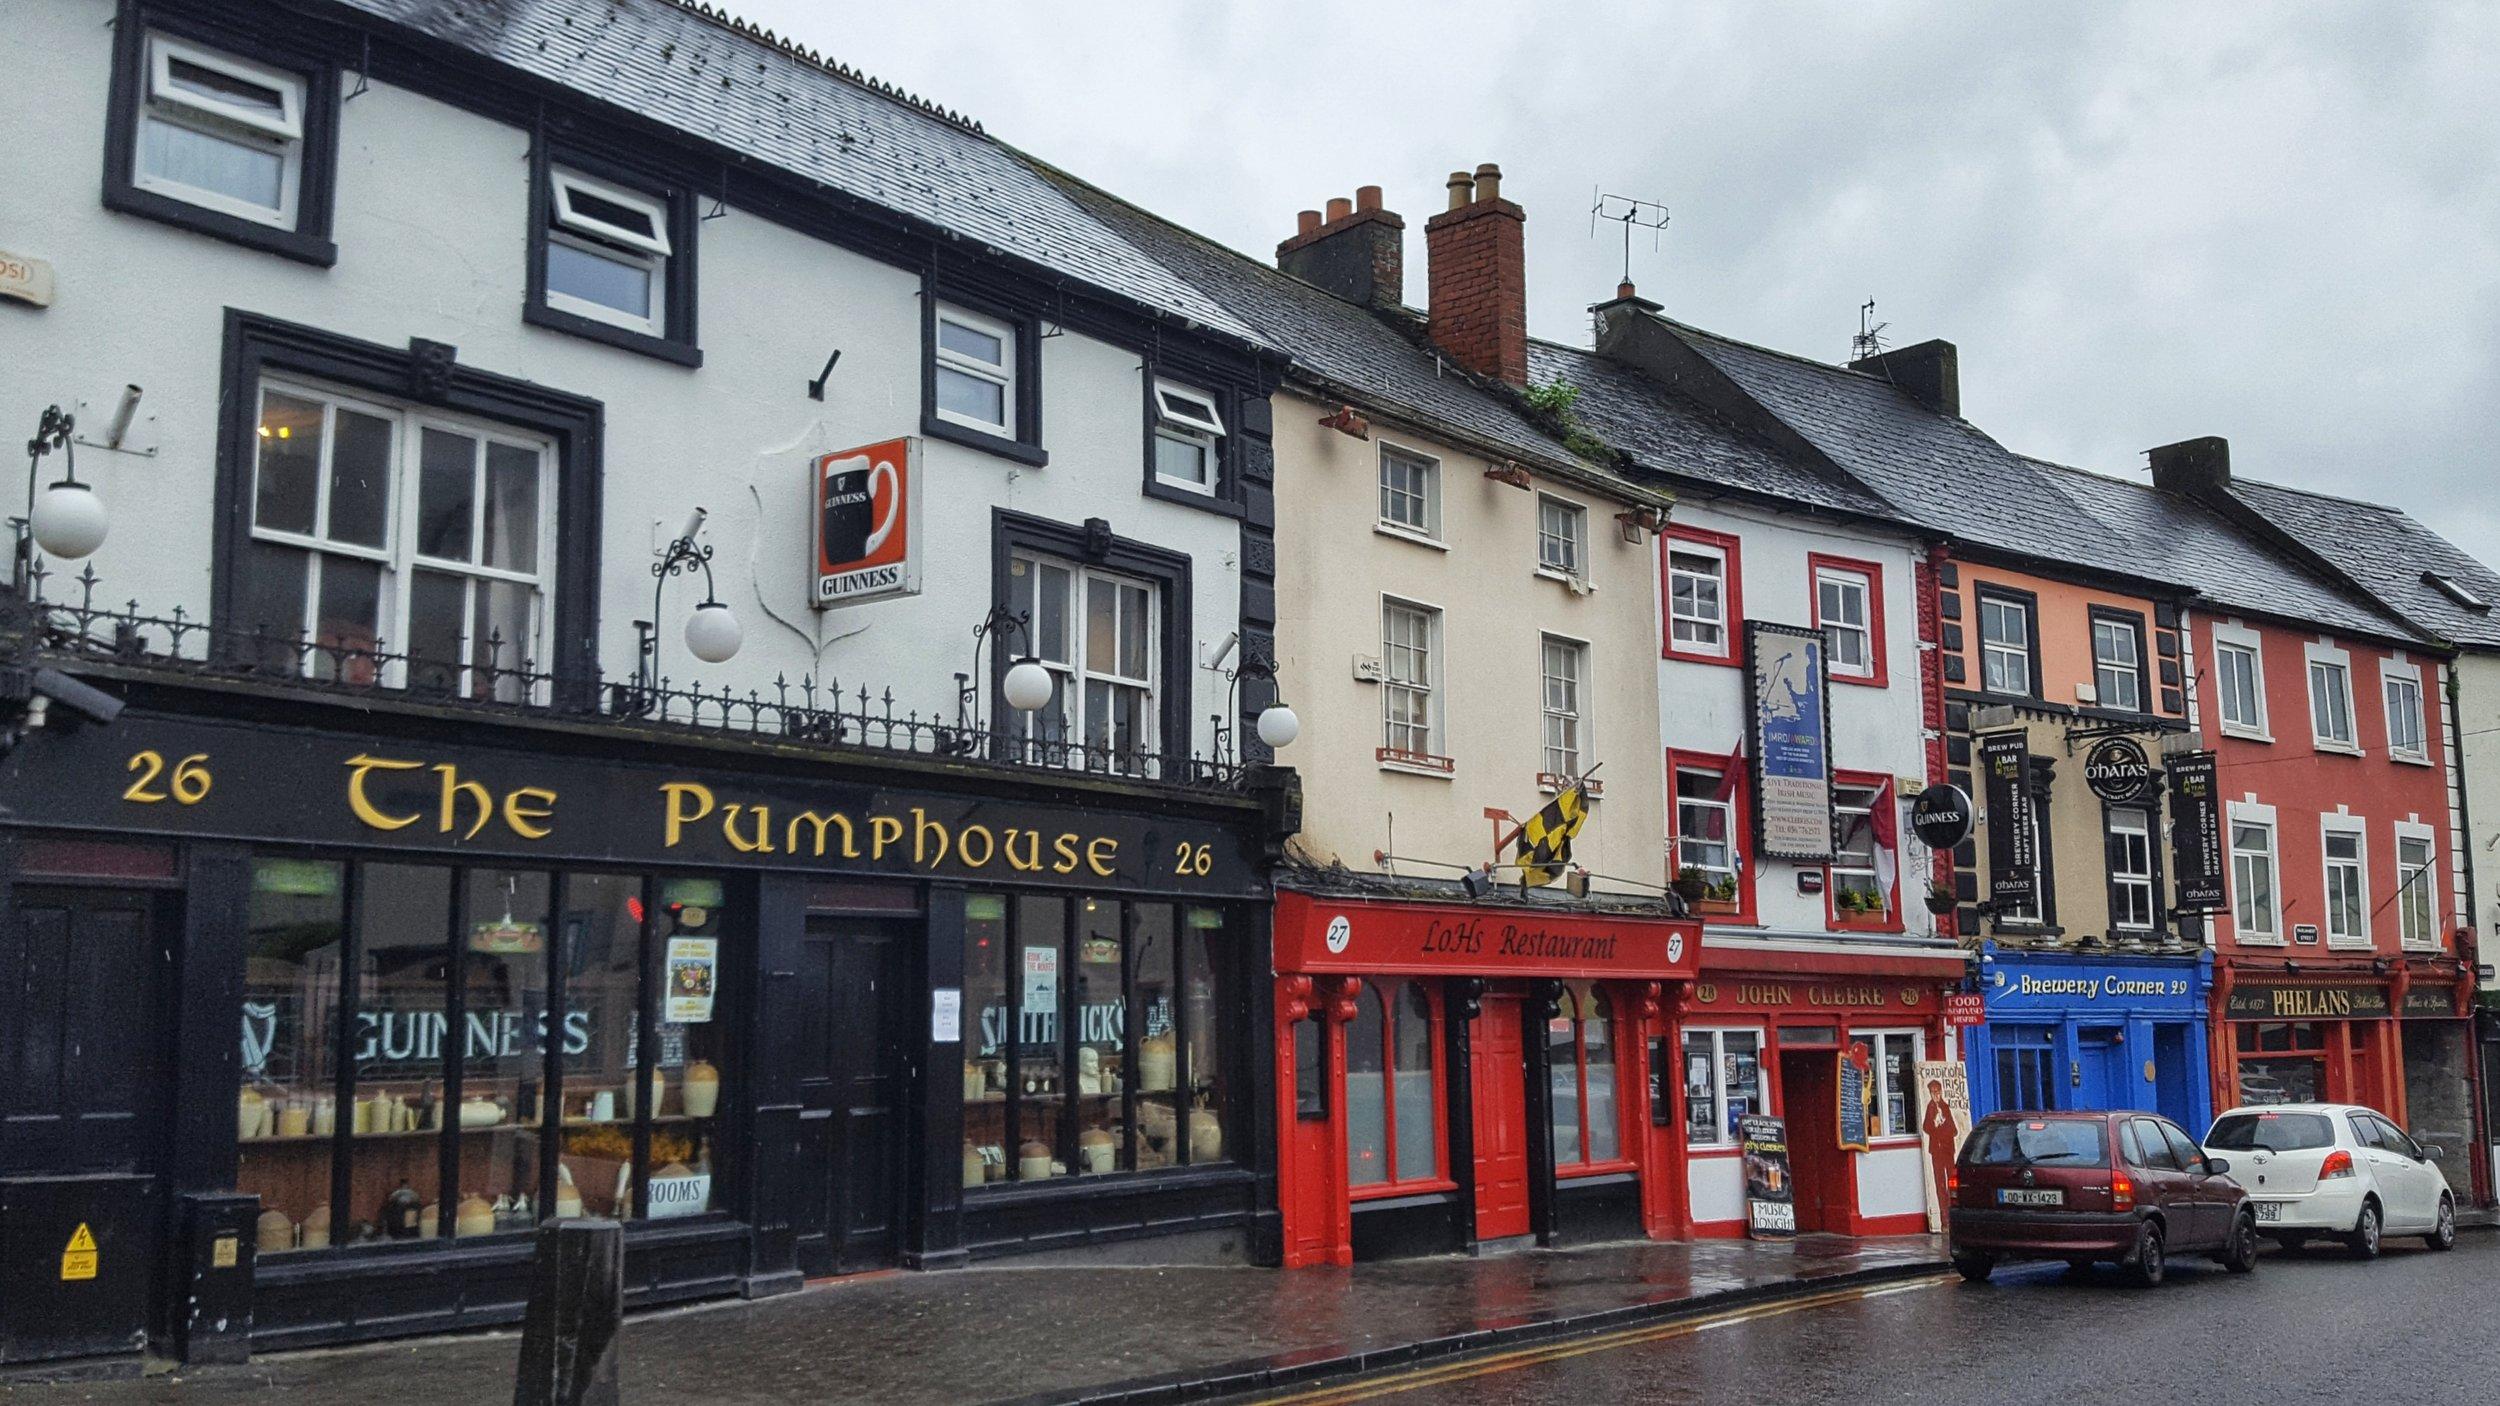 Beautiful buildings along the main road in Kilkenny, Ireland.